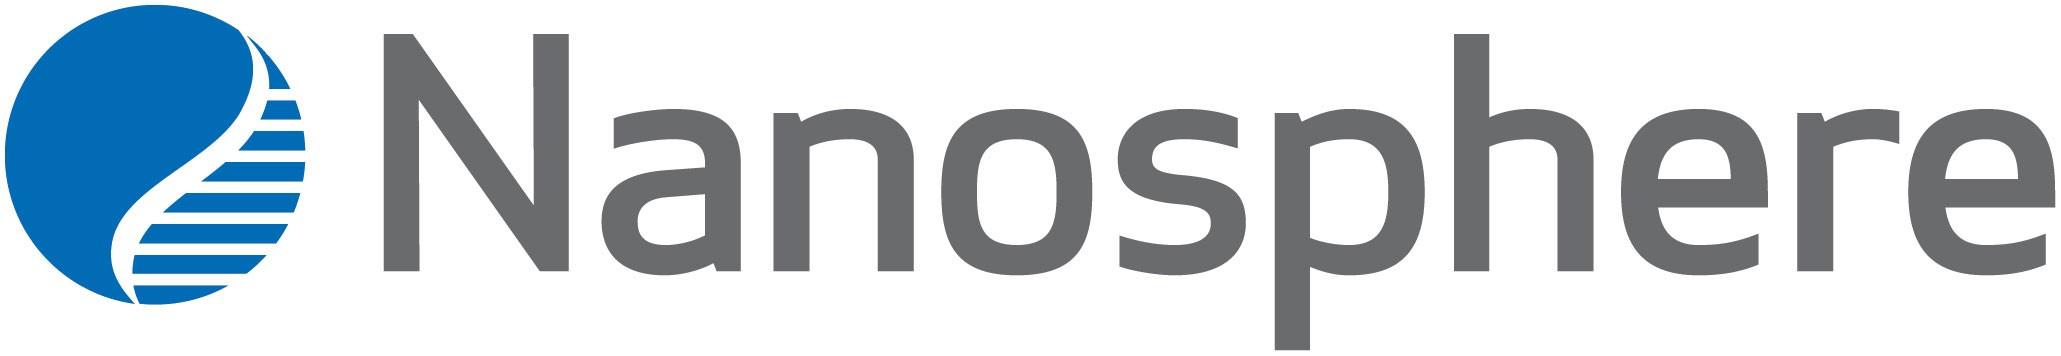 Nanosphere logo